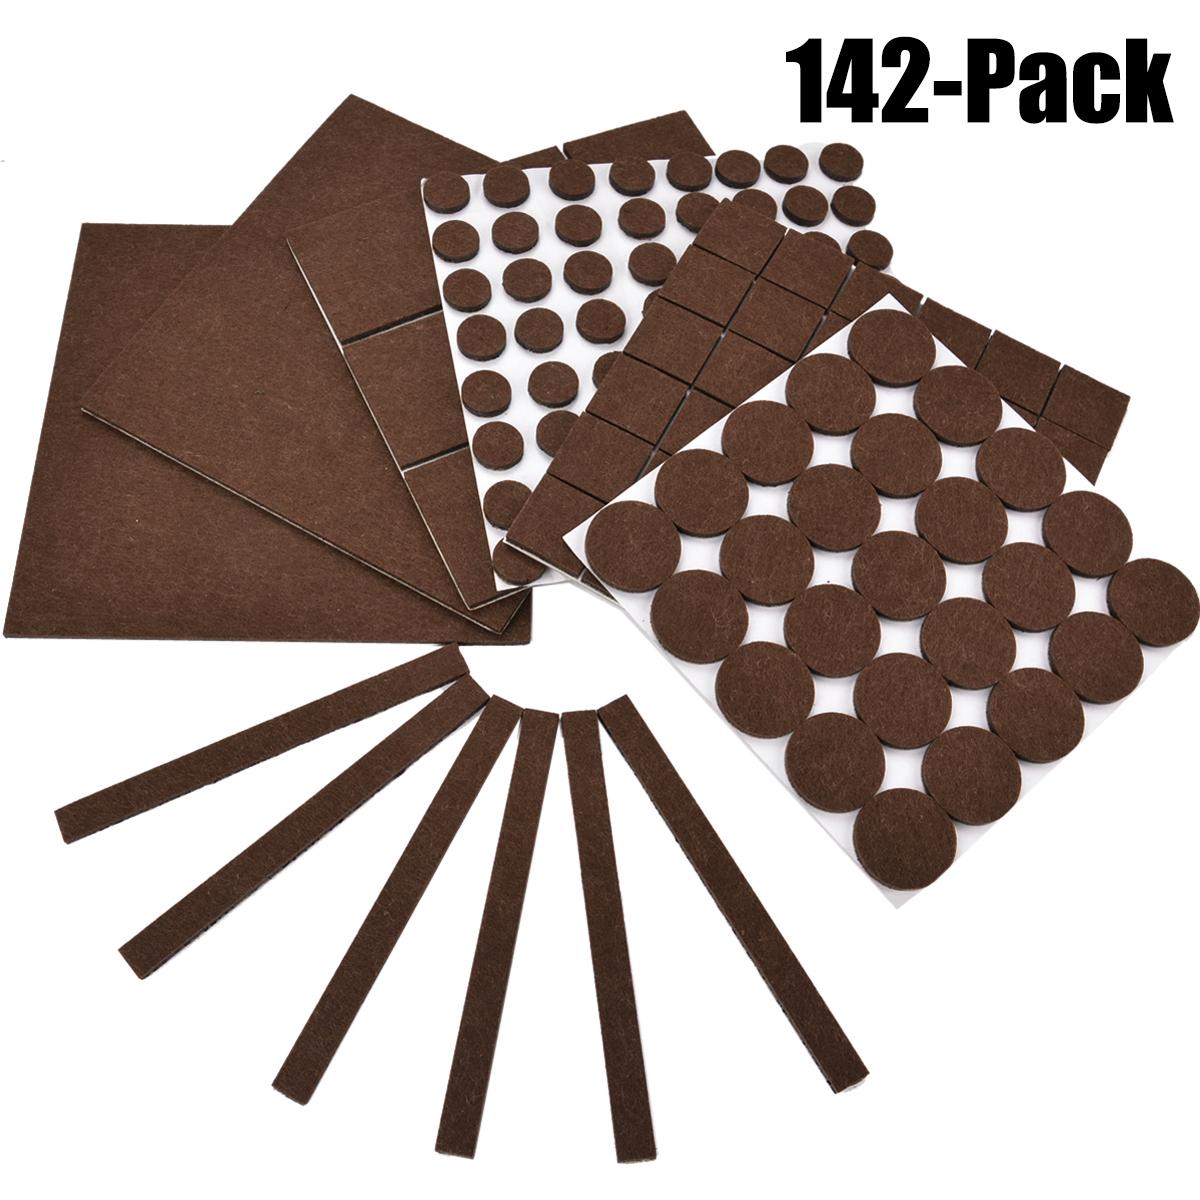 pads for chair legs wheelchair parts 142pcs furniture outgeek felt floor protectors assorted size table desk walmart com